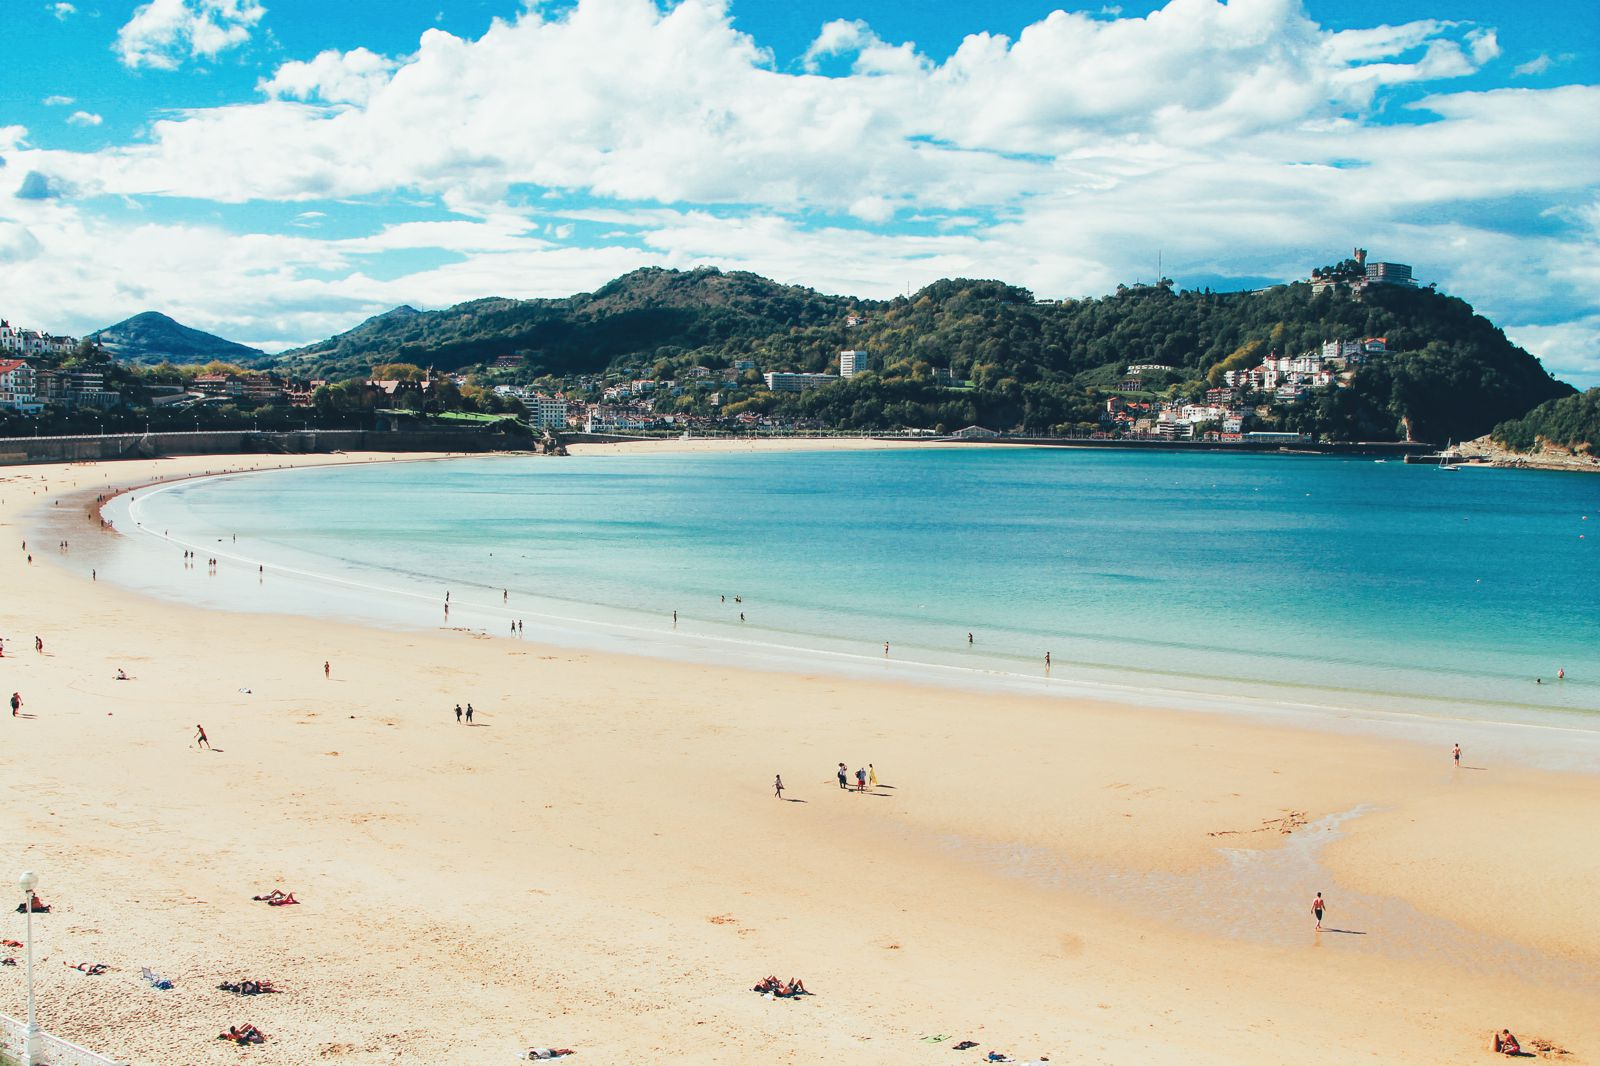 The Most Beautiful City in Spain. San Sebastian, Gipuzkoa, Spain, Hotel Londres (17)